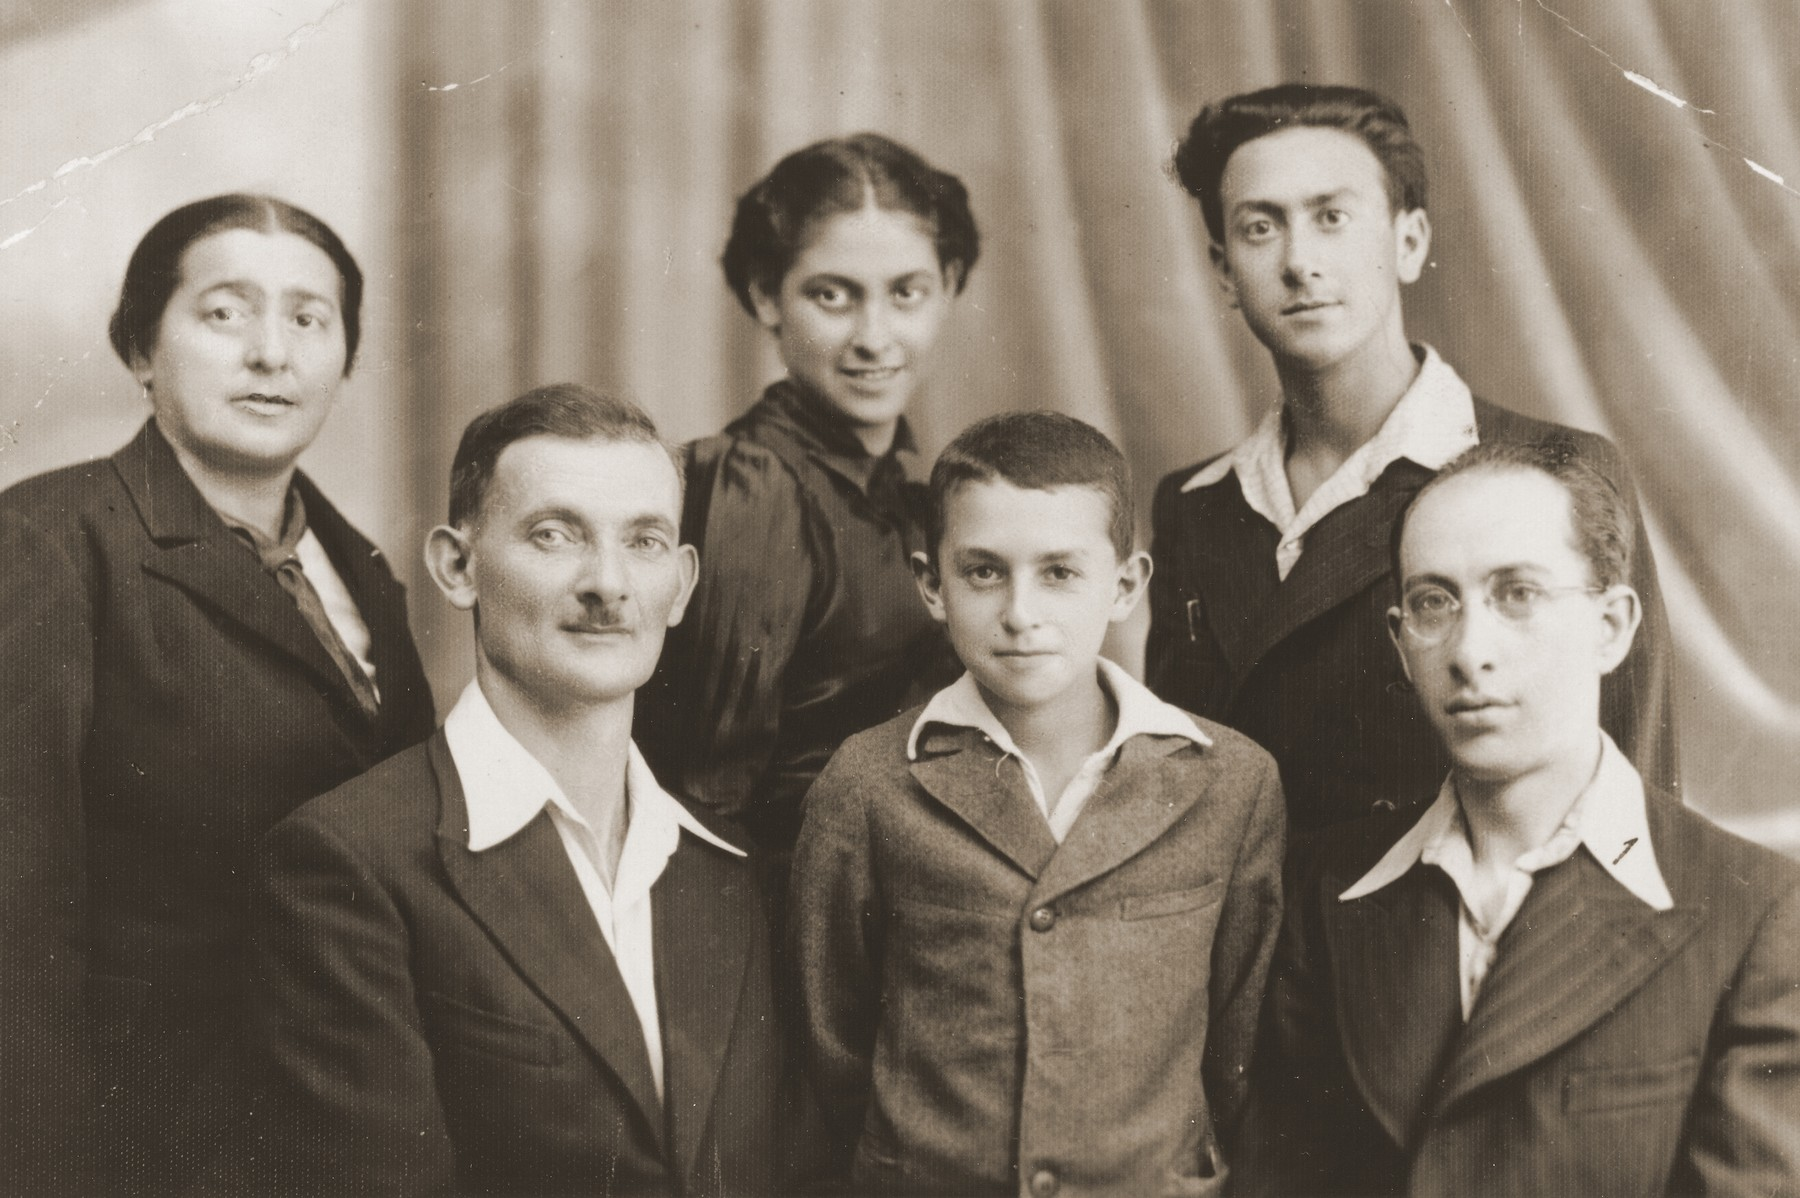 Studio portrait of members of the Holstein family in Zyrardow, Poland.